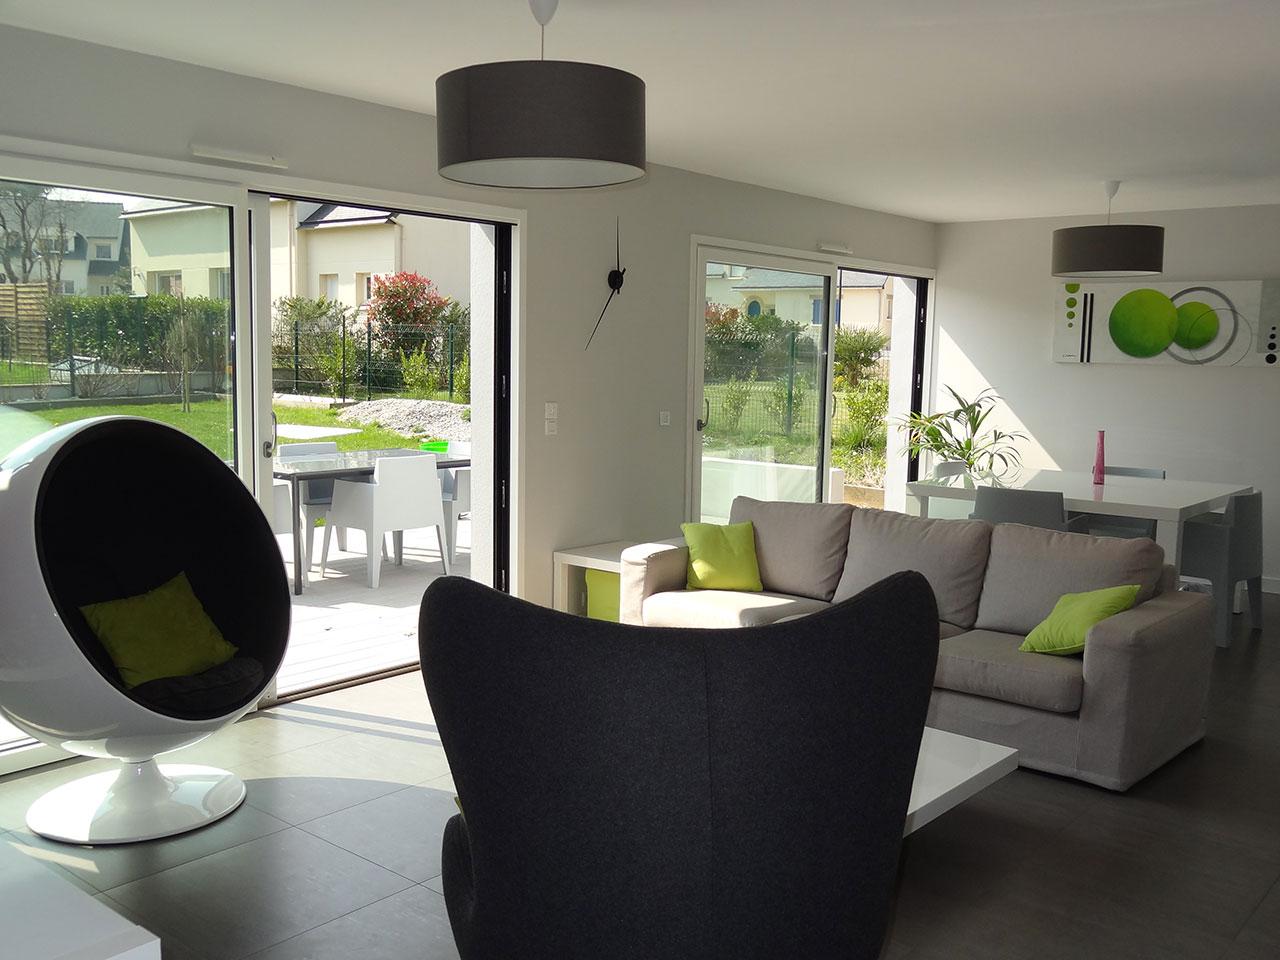 maison beton cellulaire cheap image multipor xella maison passive with maison beton cellulaire. Black Bedroom Furniture Sets. Home Design Ideas